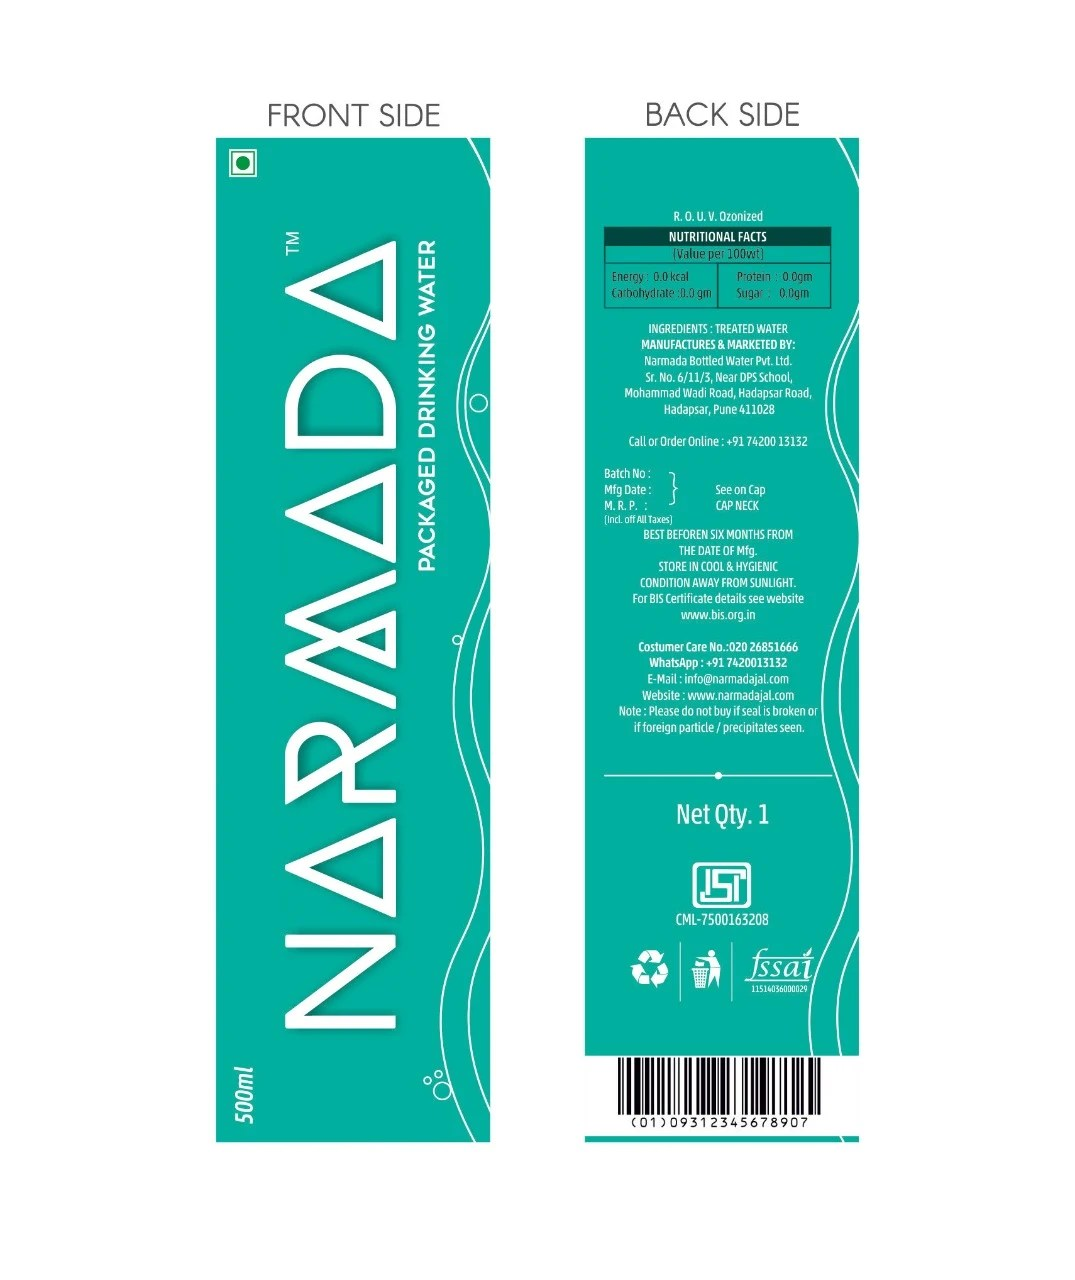 Packaging Designs reference Design Label